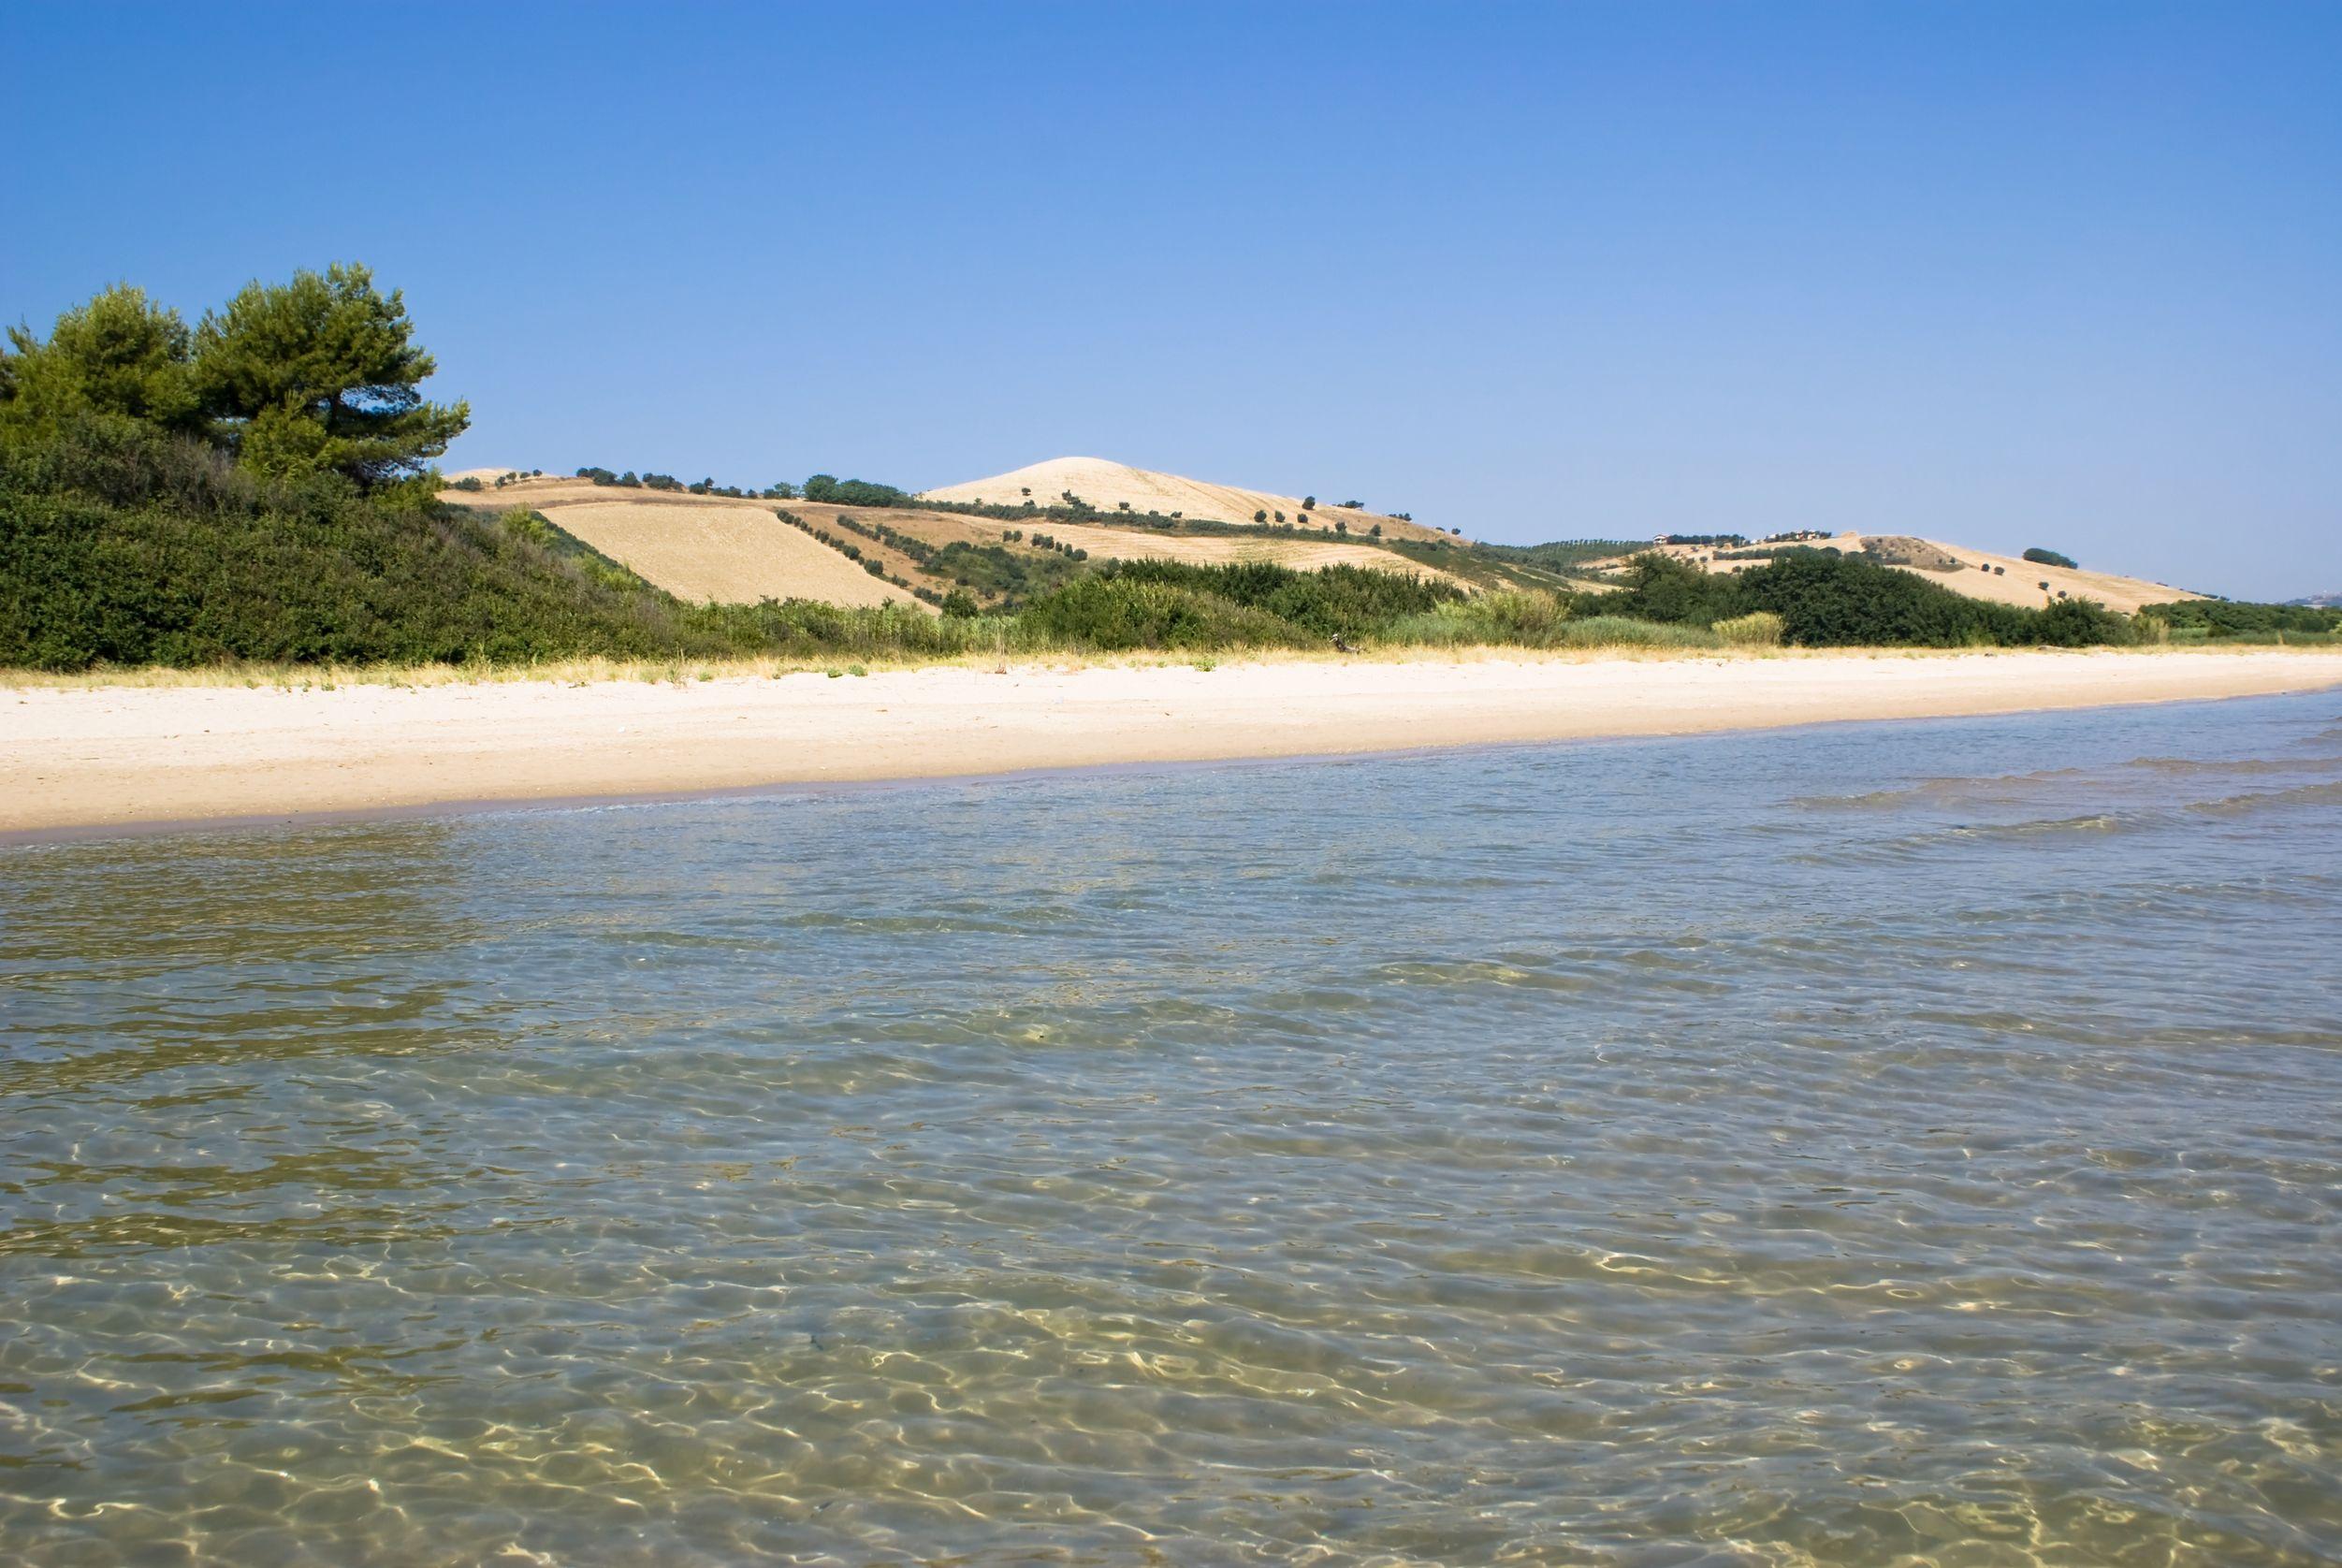 Pescara Strand de mooiste stranden abruzzo reisbureau reisgraag nl